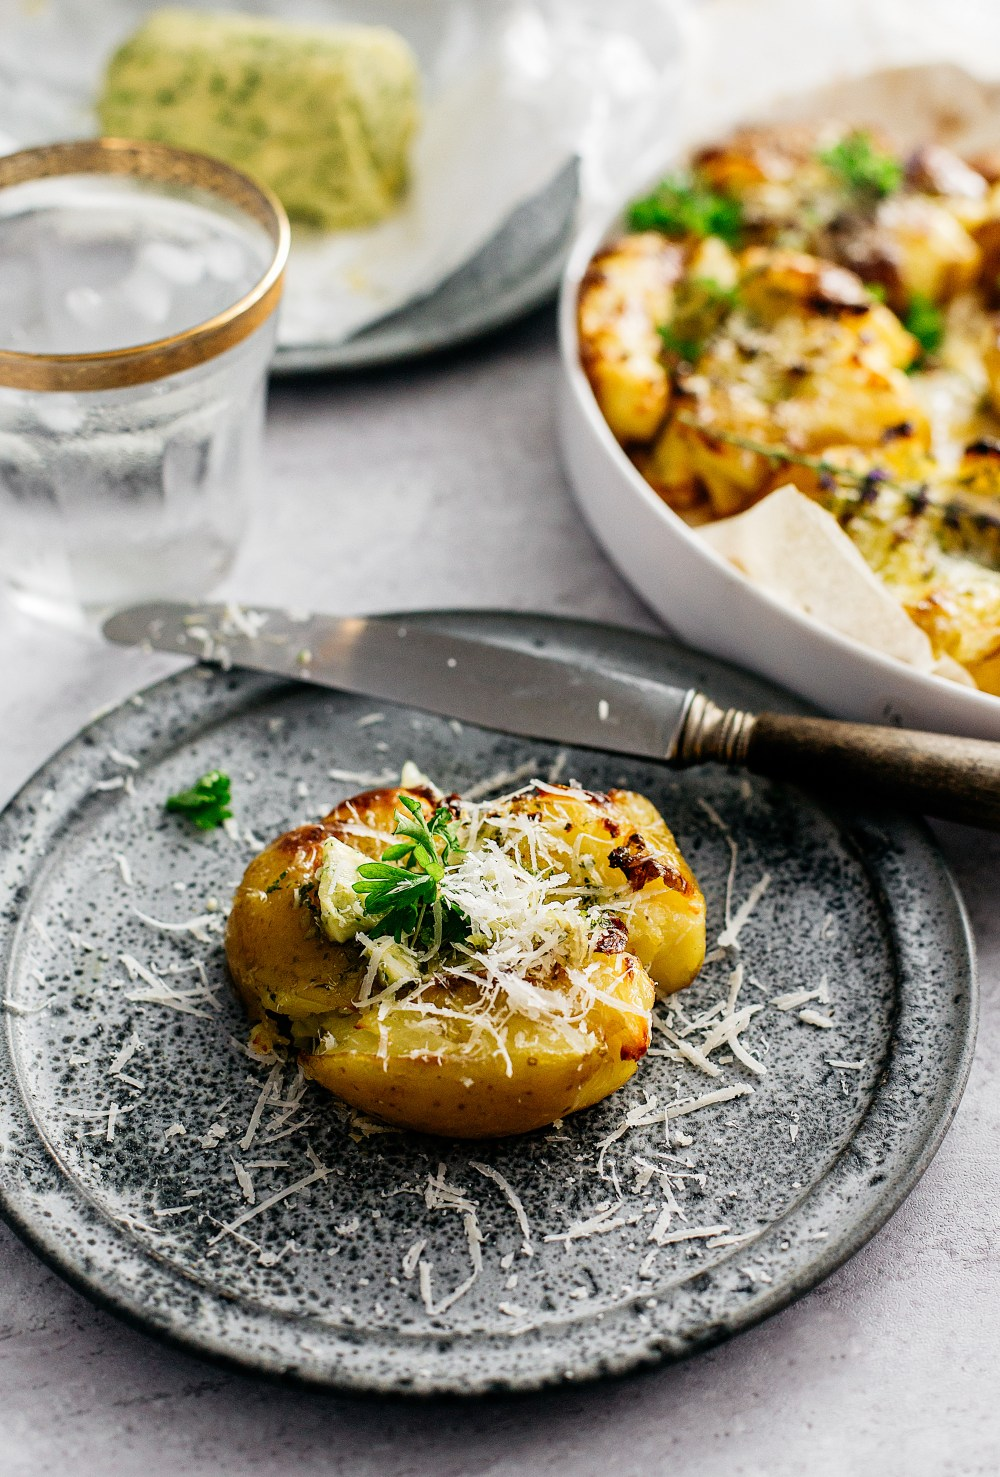 smashed potatoes, grillmad, knuste kartofler i ovn